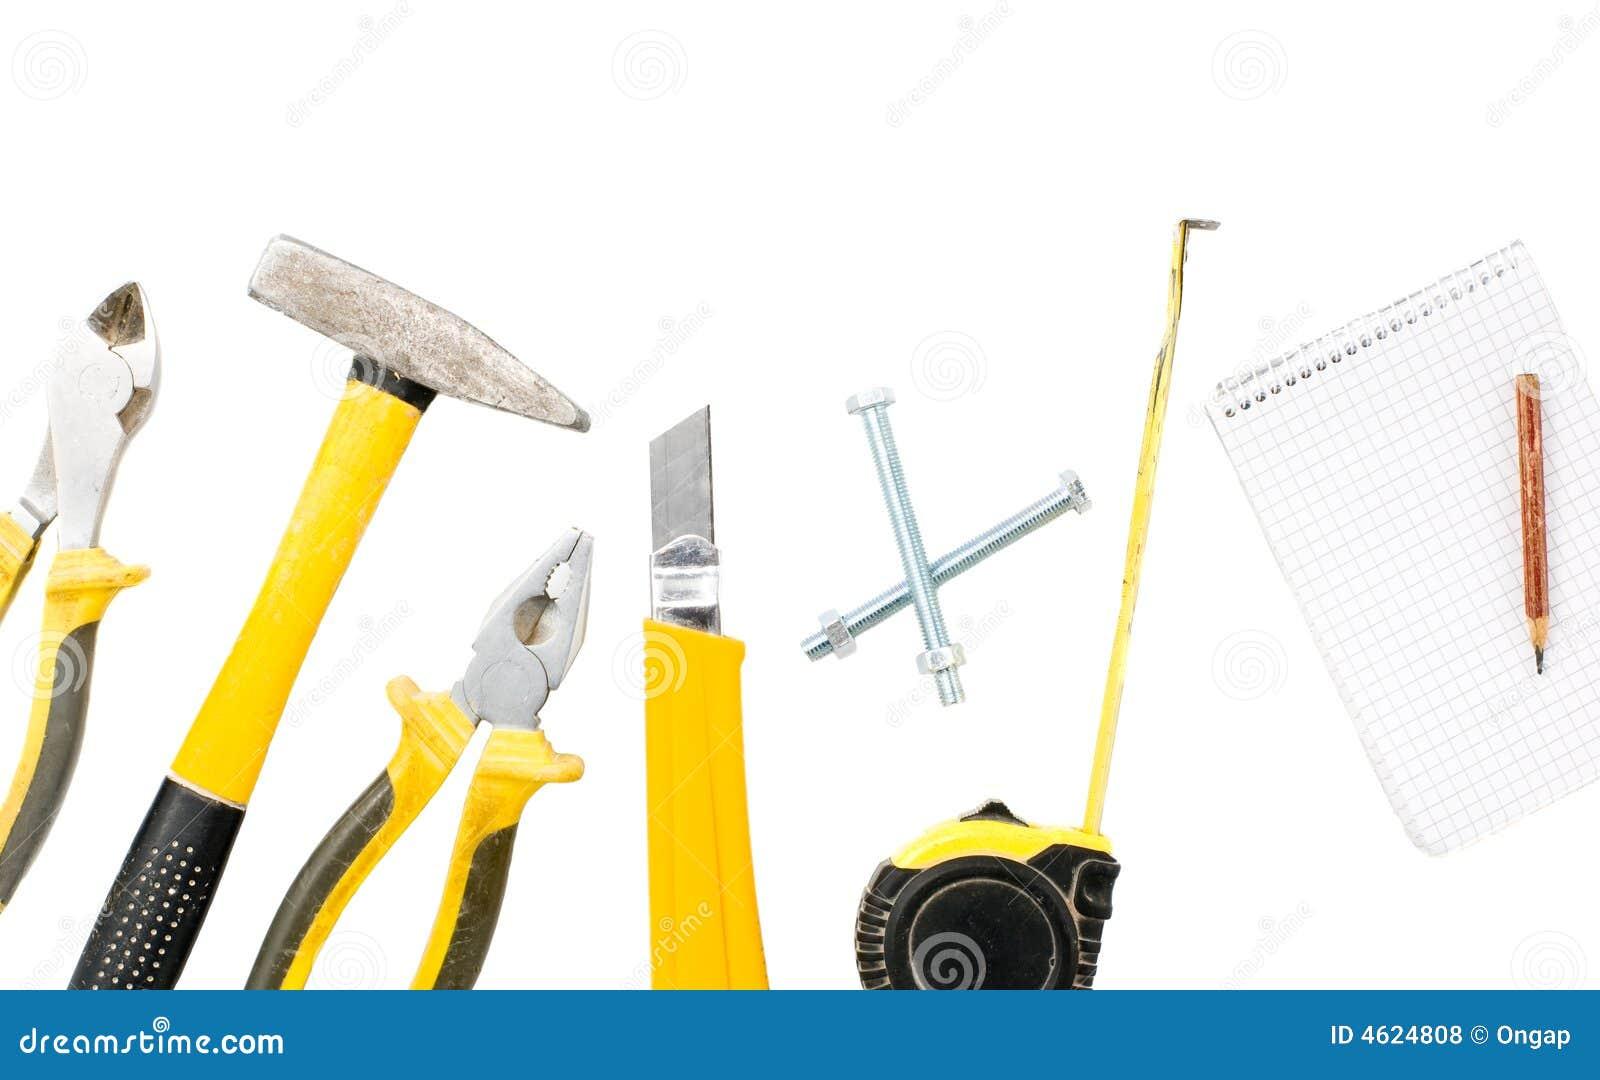 Tools and home improvement 2017 grasscloth wallpaper for Wallpaper home improvement